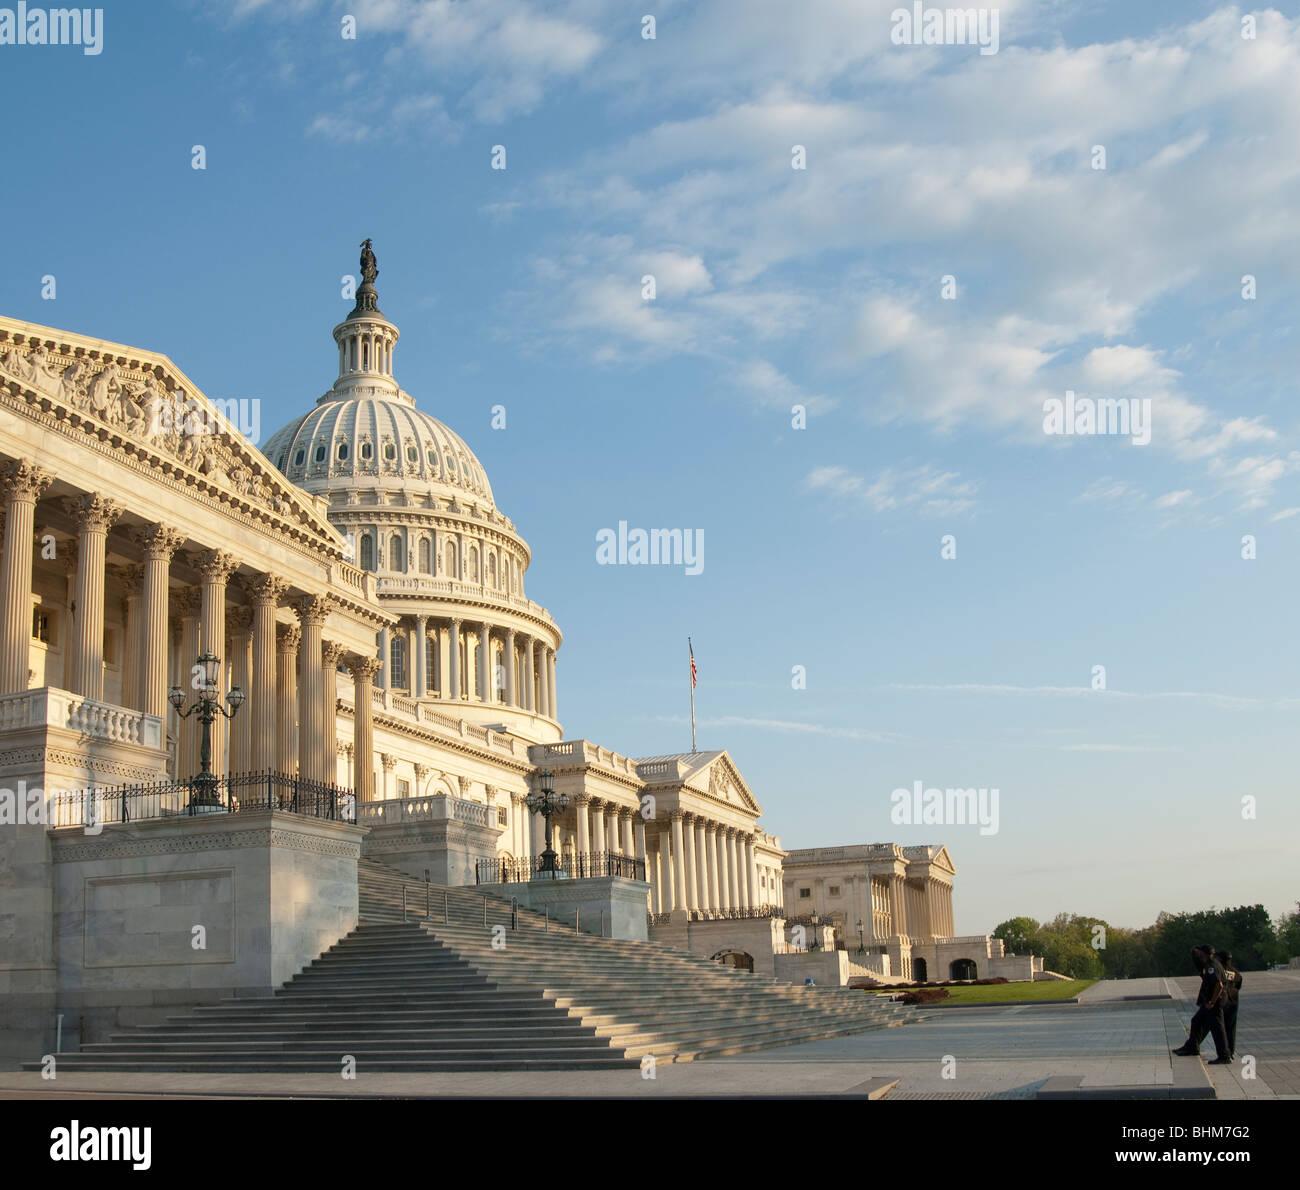 U.S. Capitol in Washington D.C. - Stock Image